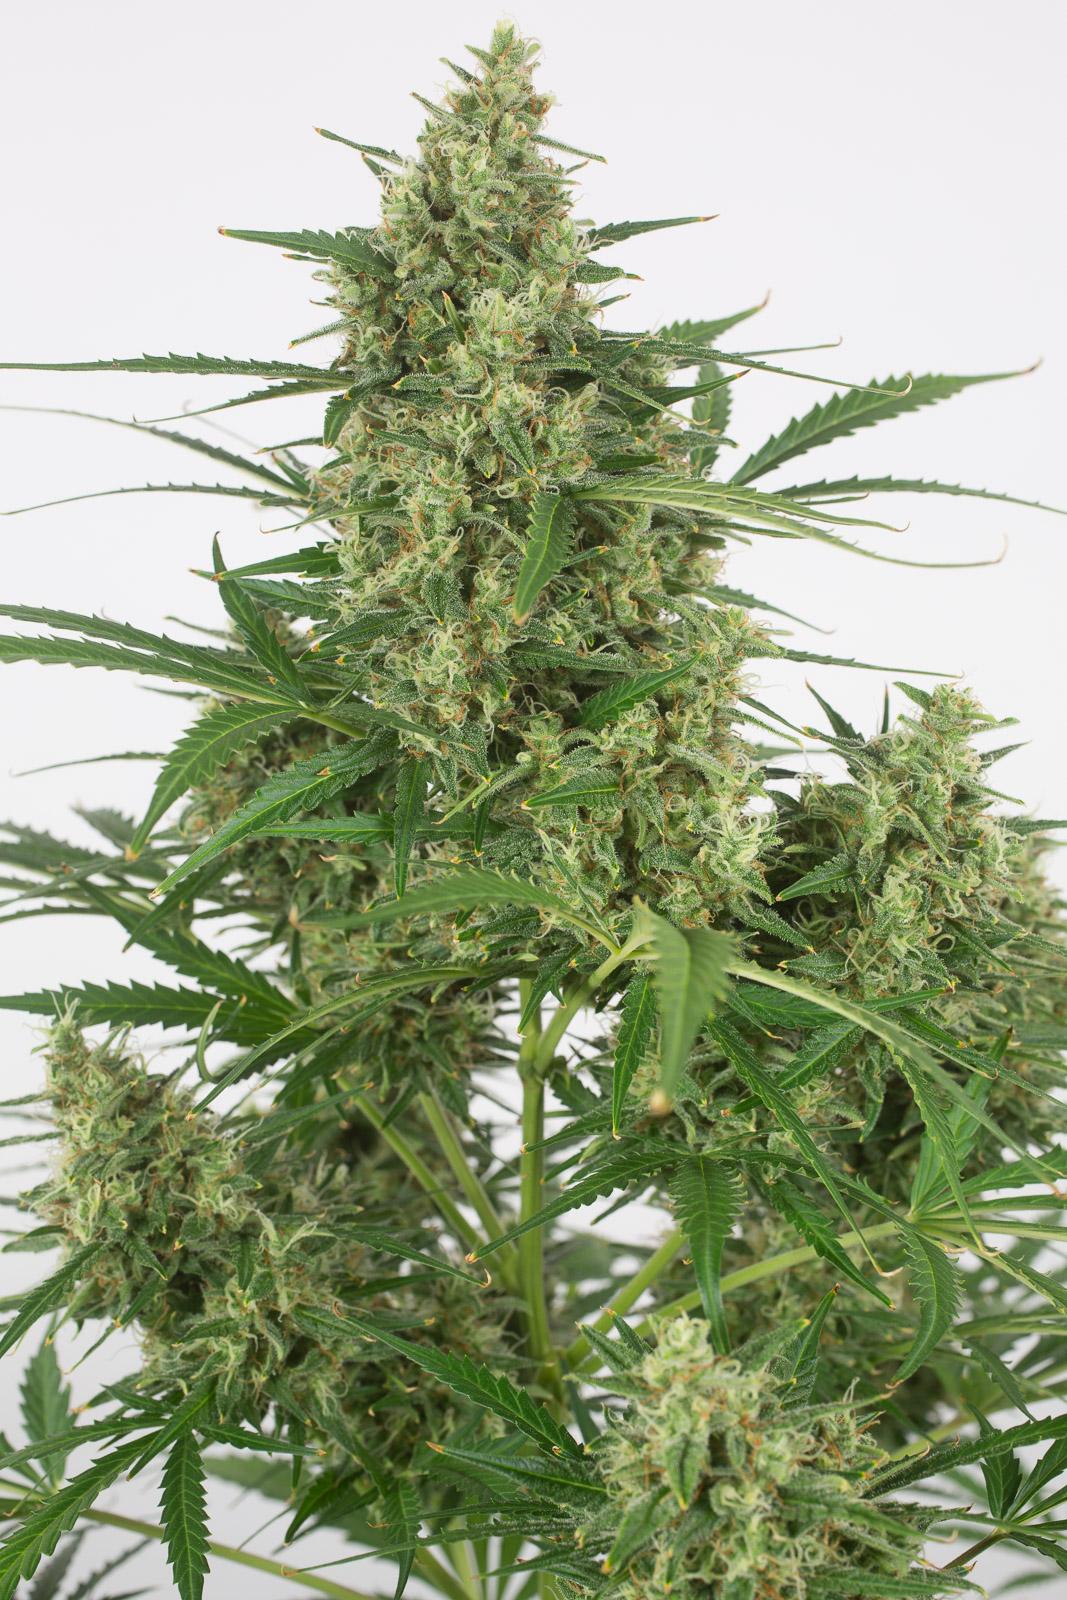 Critical + 2 0 Autoflowering – Buy Critical + 2 0 Auto cannabis seeds